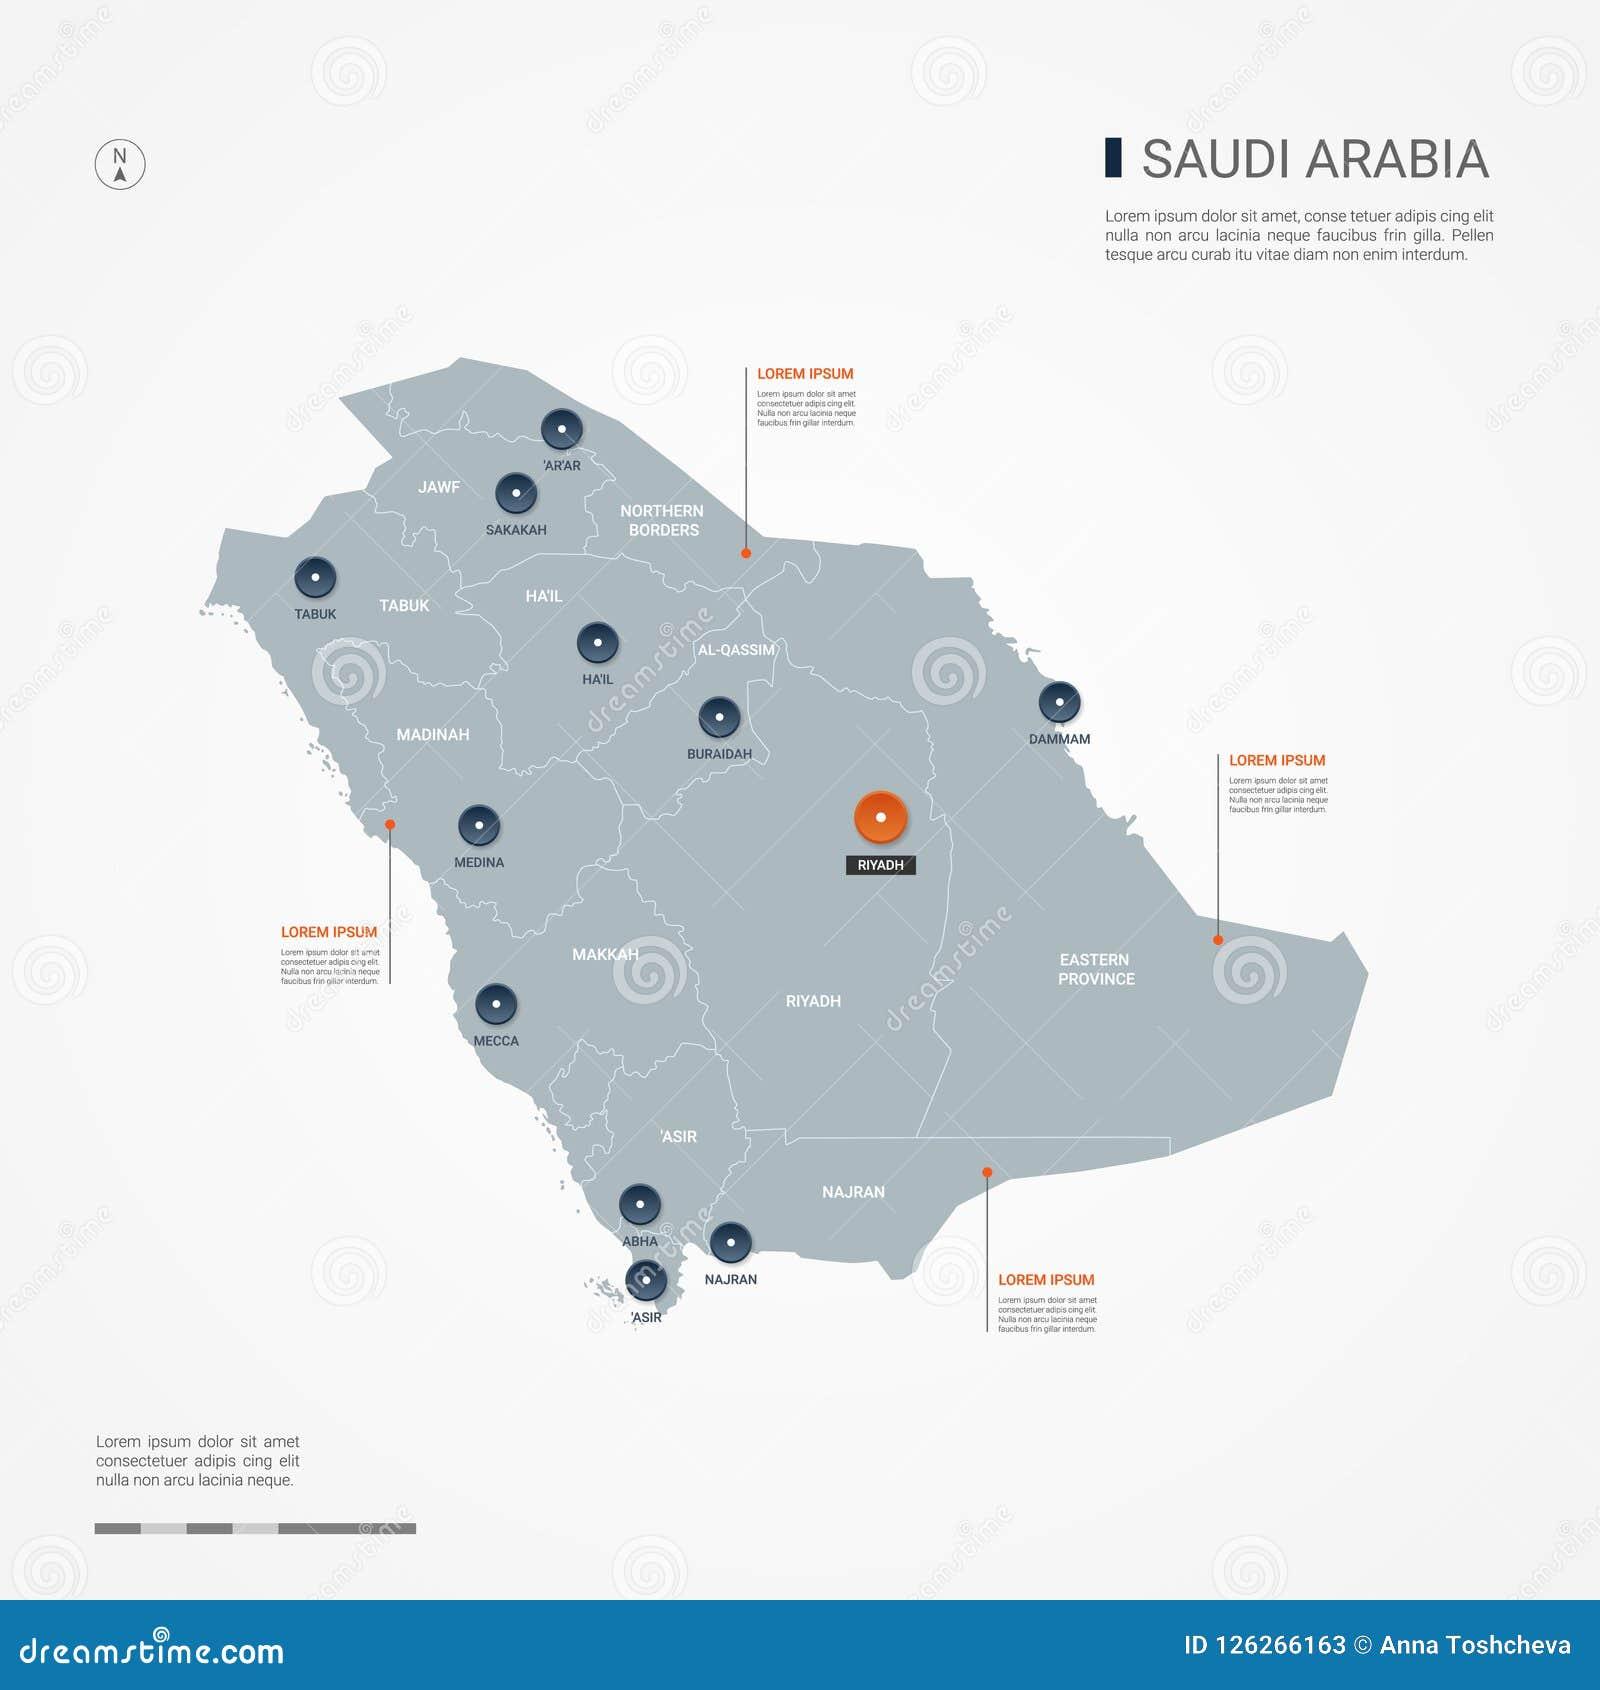 Saudi Arabia Infographic Map Vector Illustration  Stock